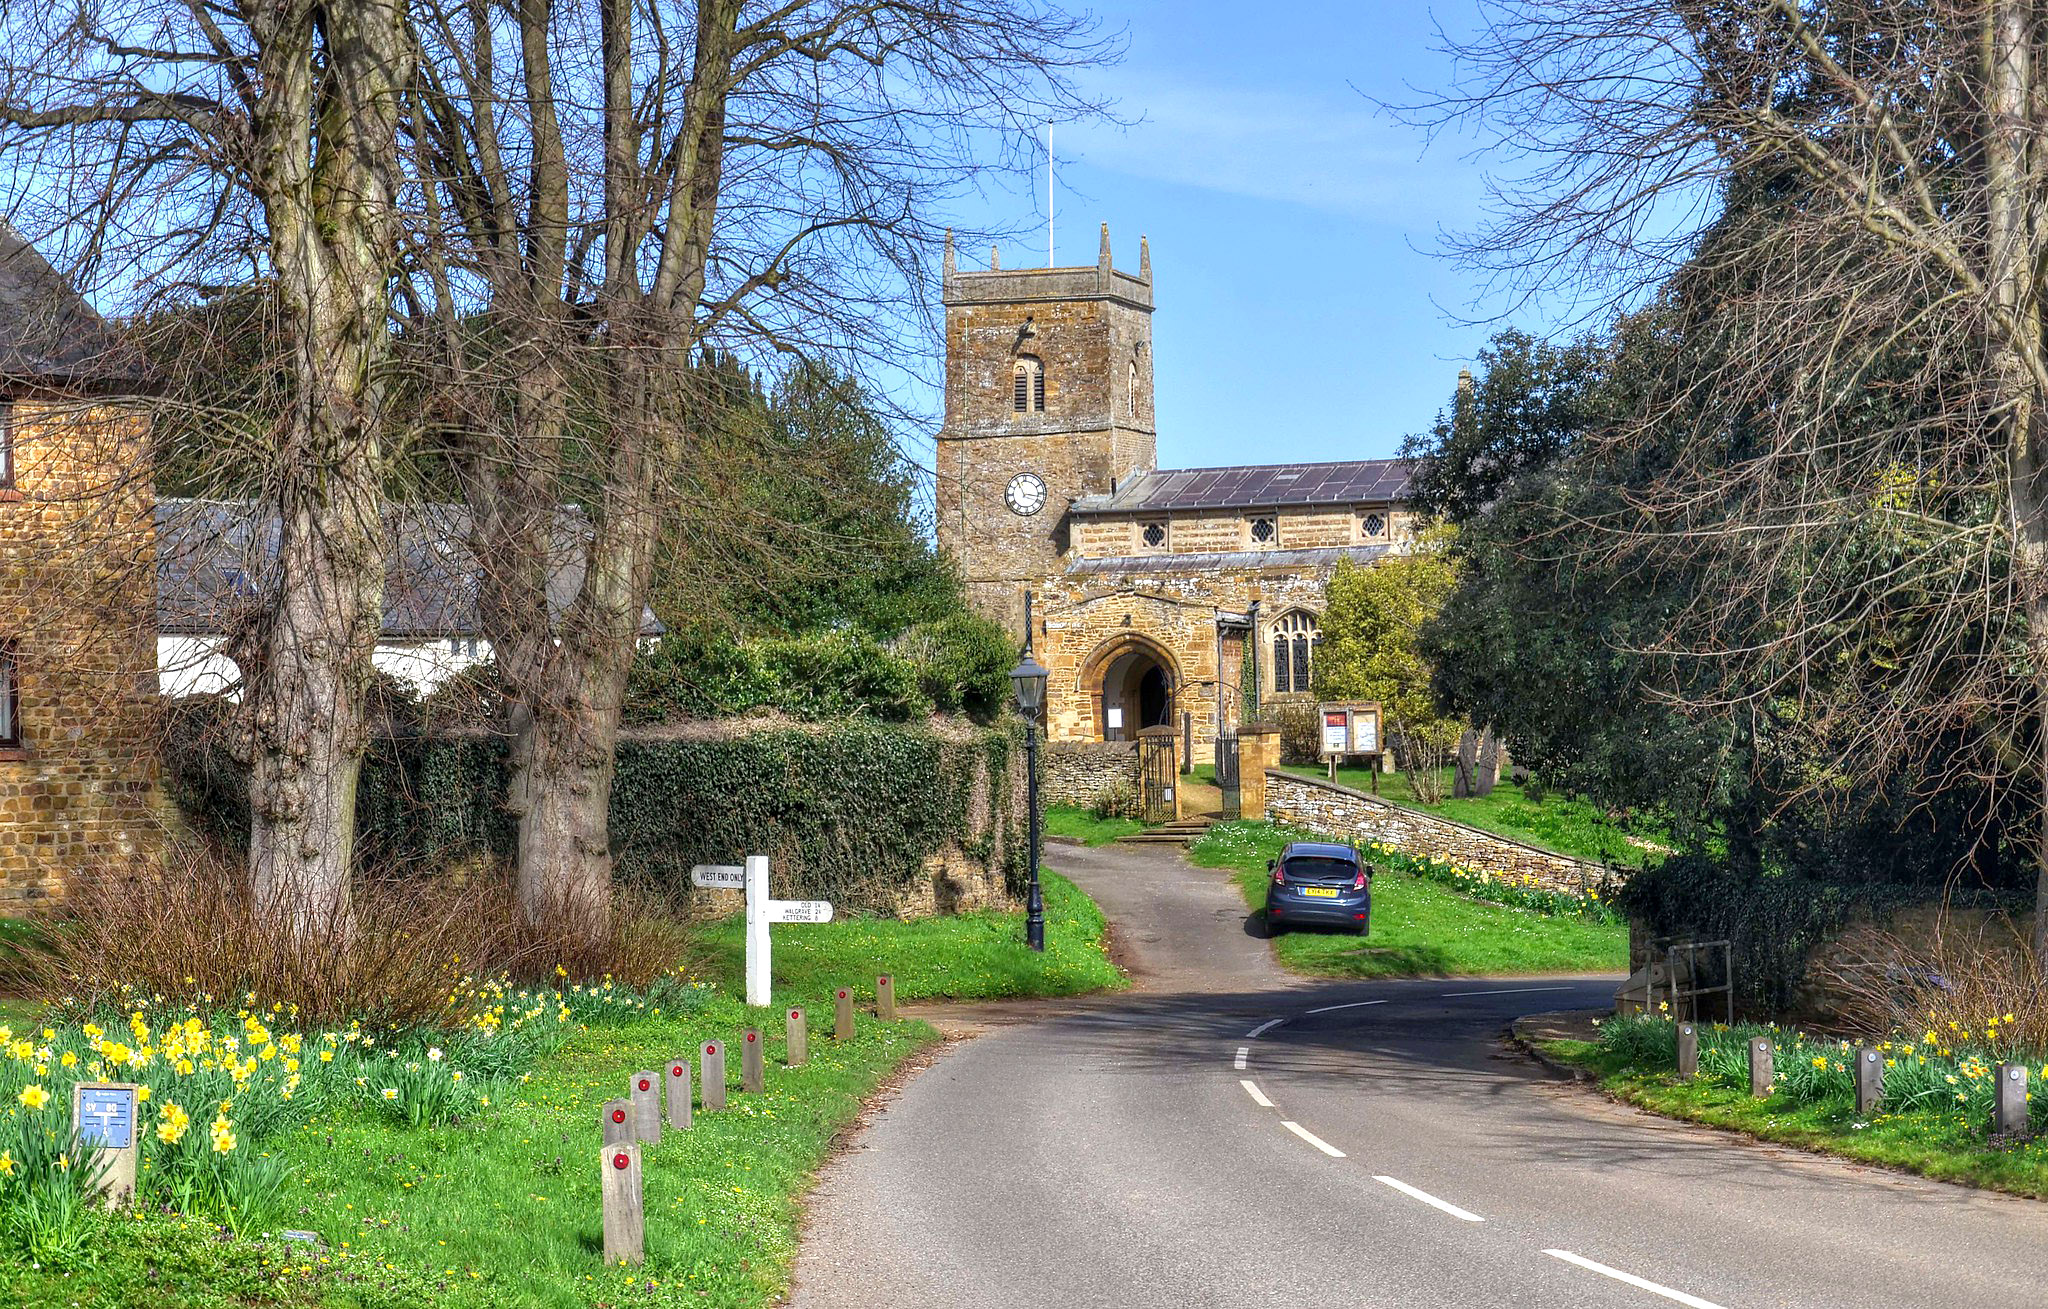 Scaldwell, Northamptonshire by Baz Richardson.jpg